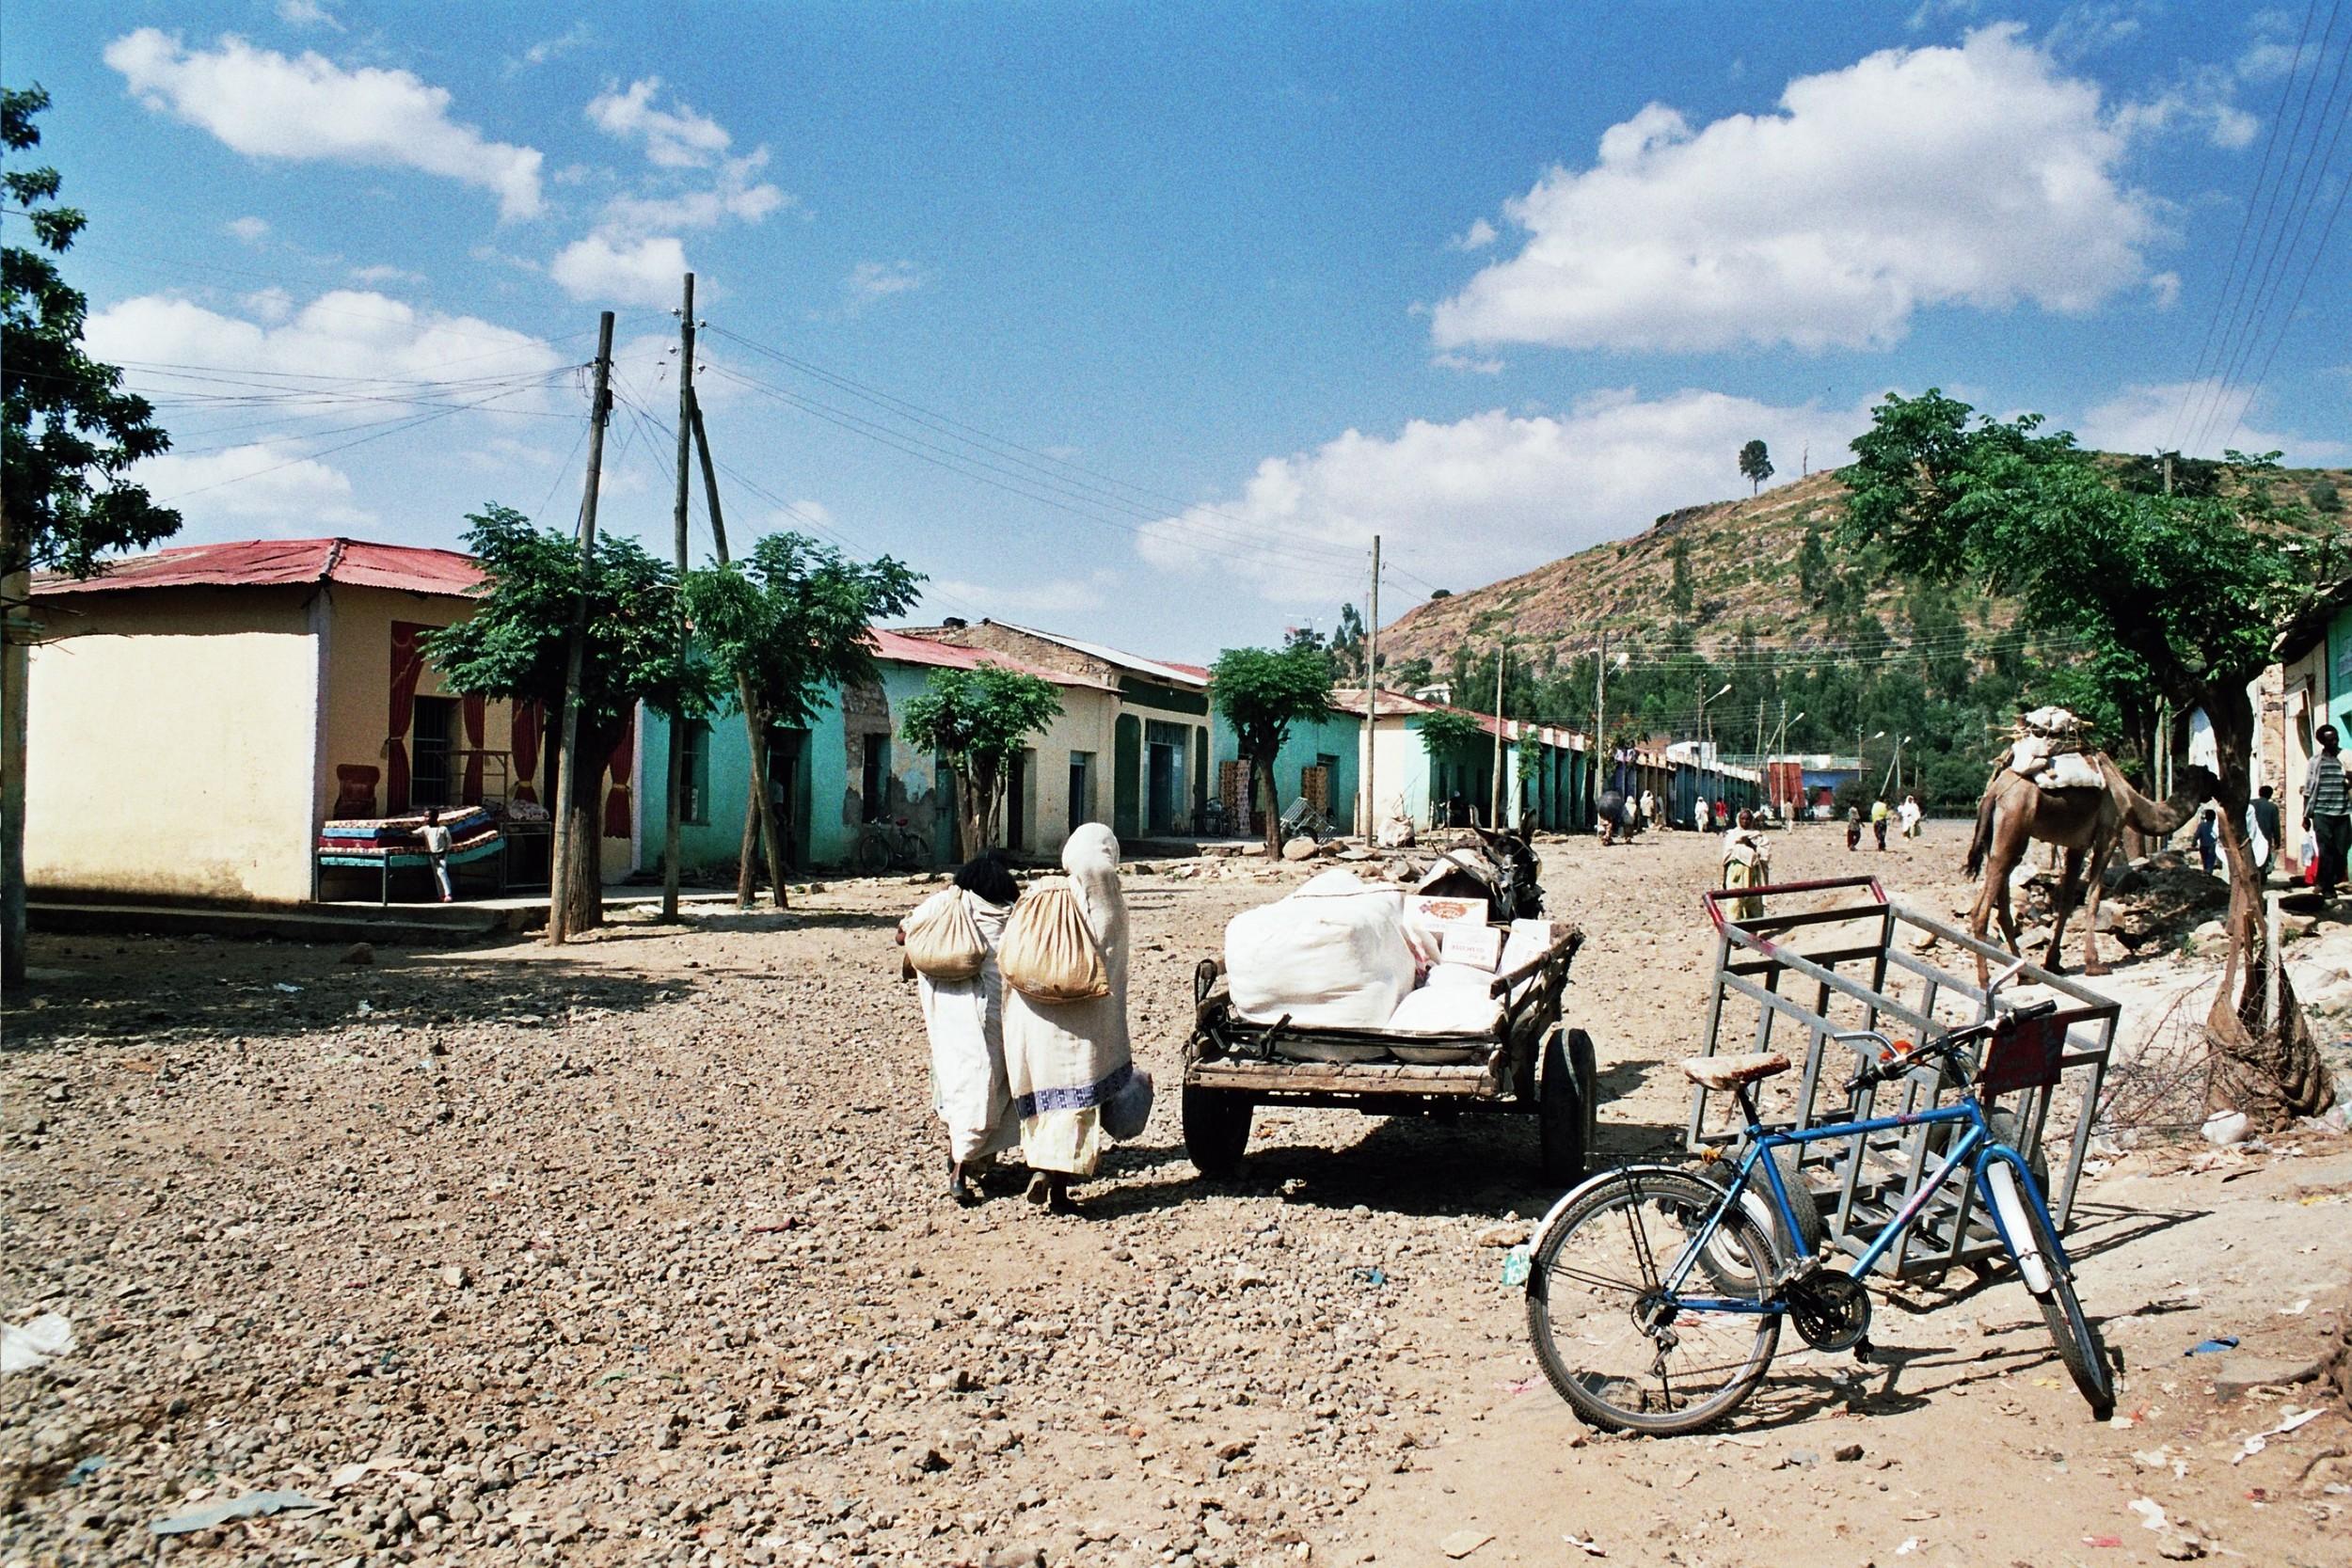 A street in Axum, Ethiopia